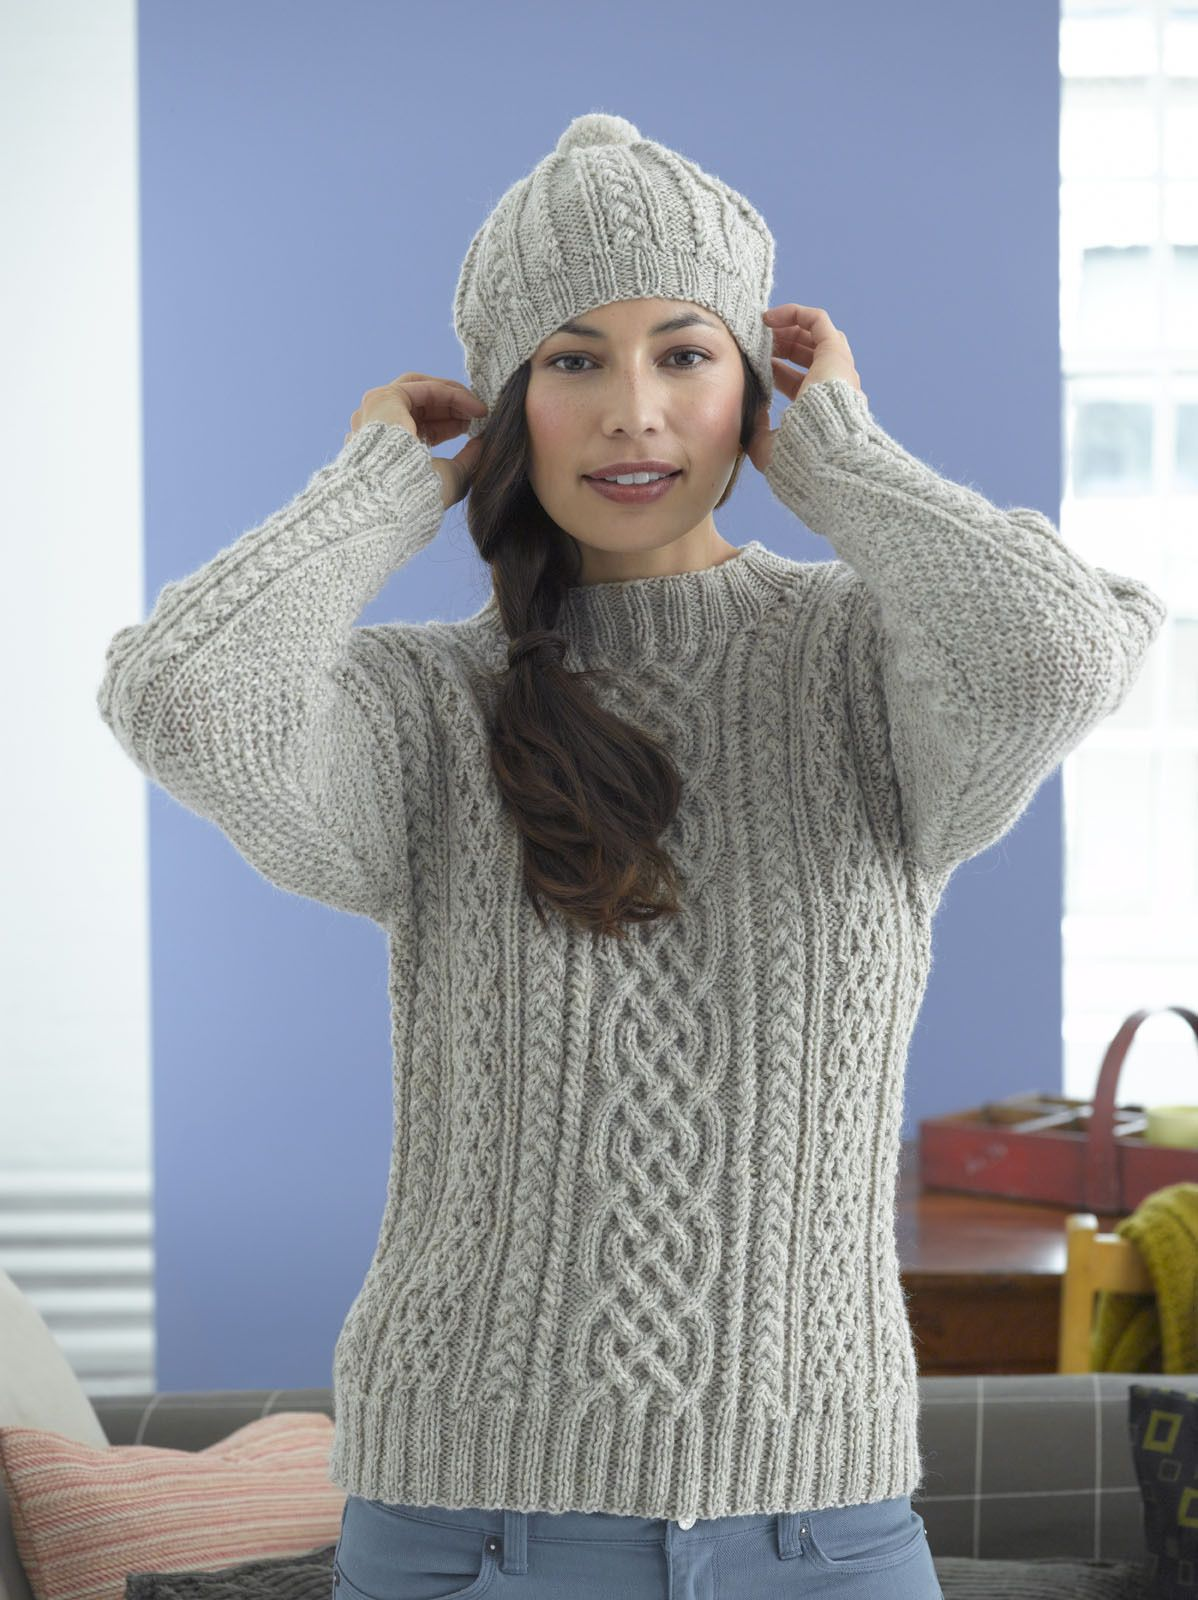 Free Crochet Aran Cardigan Pattern : Top 5 FREE knitting patterns for Christmas in July ...